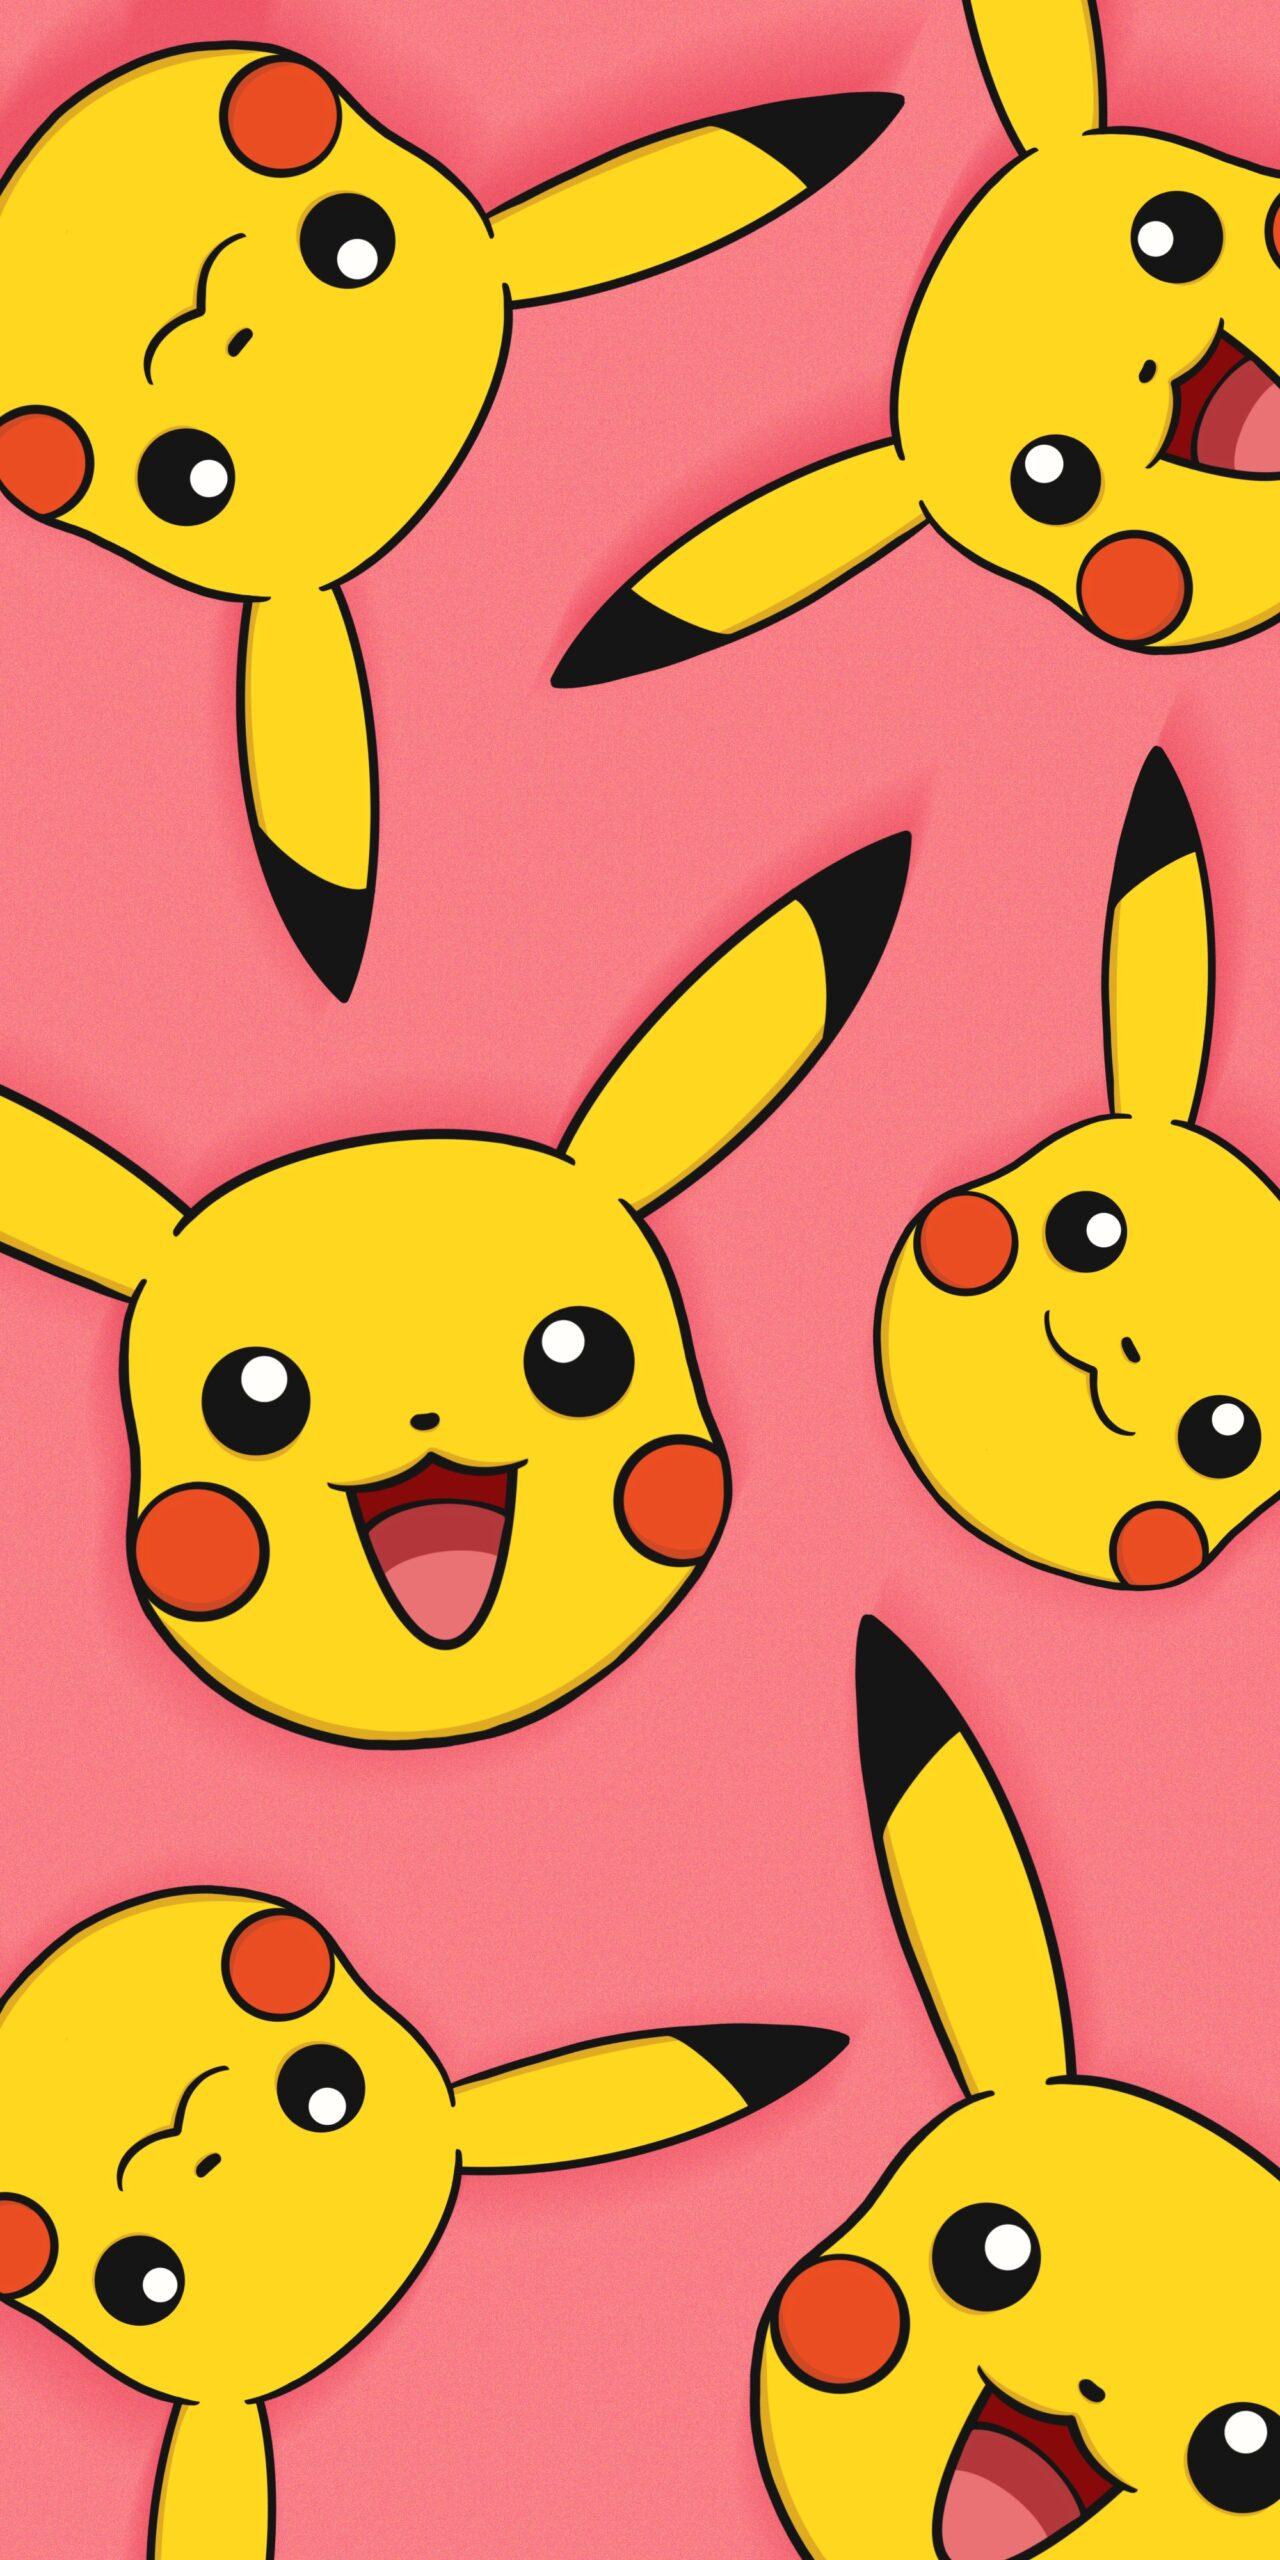 pokemon smiling pikachu pink wallpaper